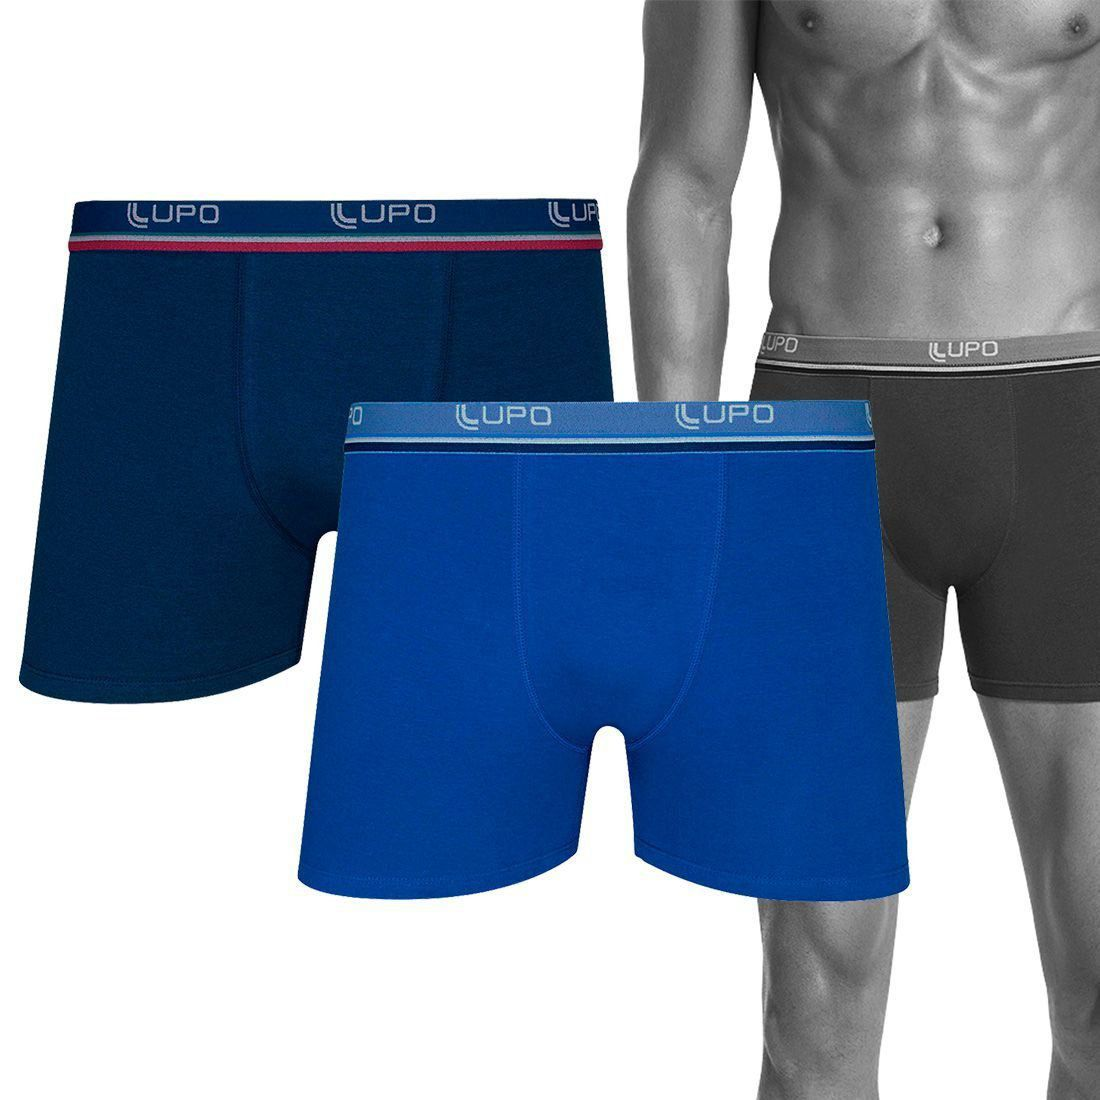 Cueca ADULTO Boxer Kit 2 cuecas 950 Lupo